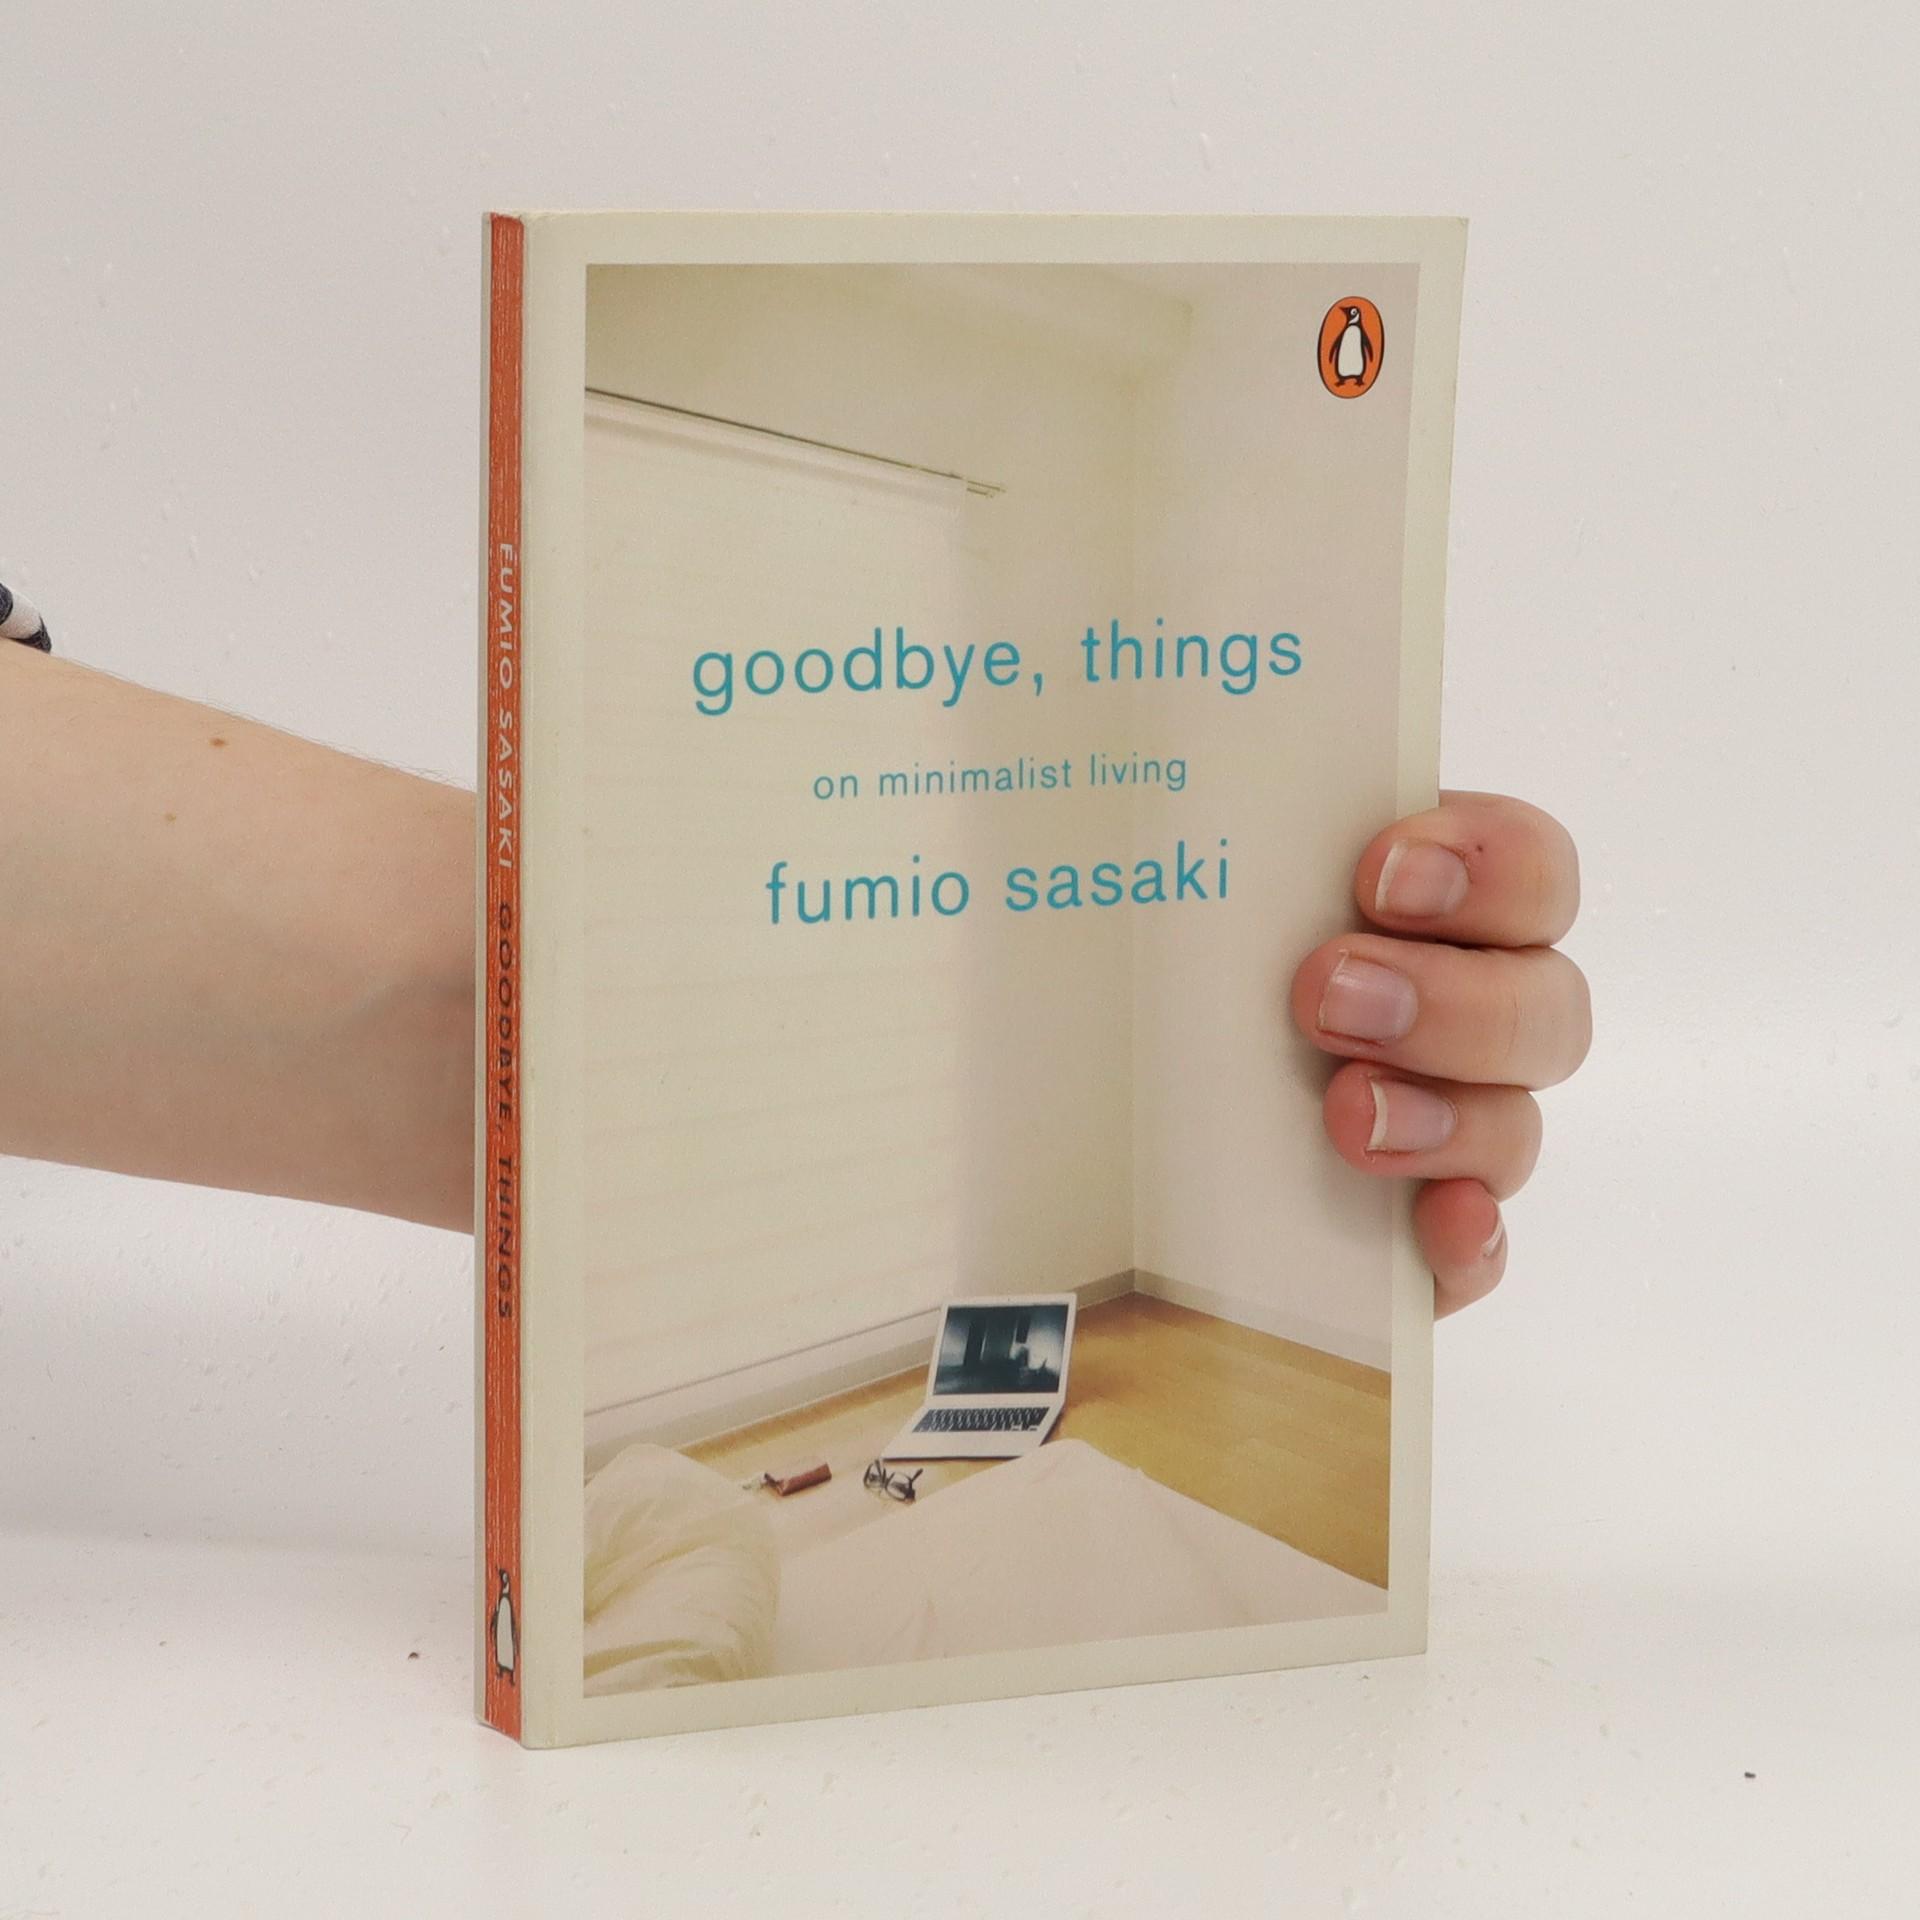 antikvární kniha Goodbye, Things, 2017